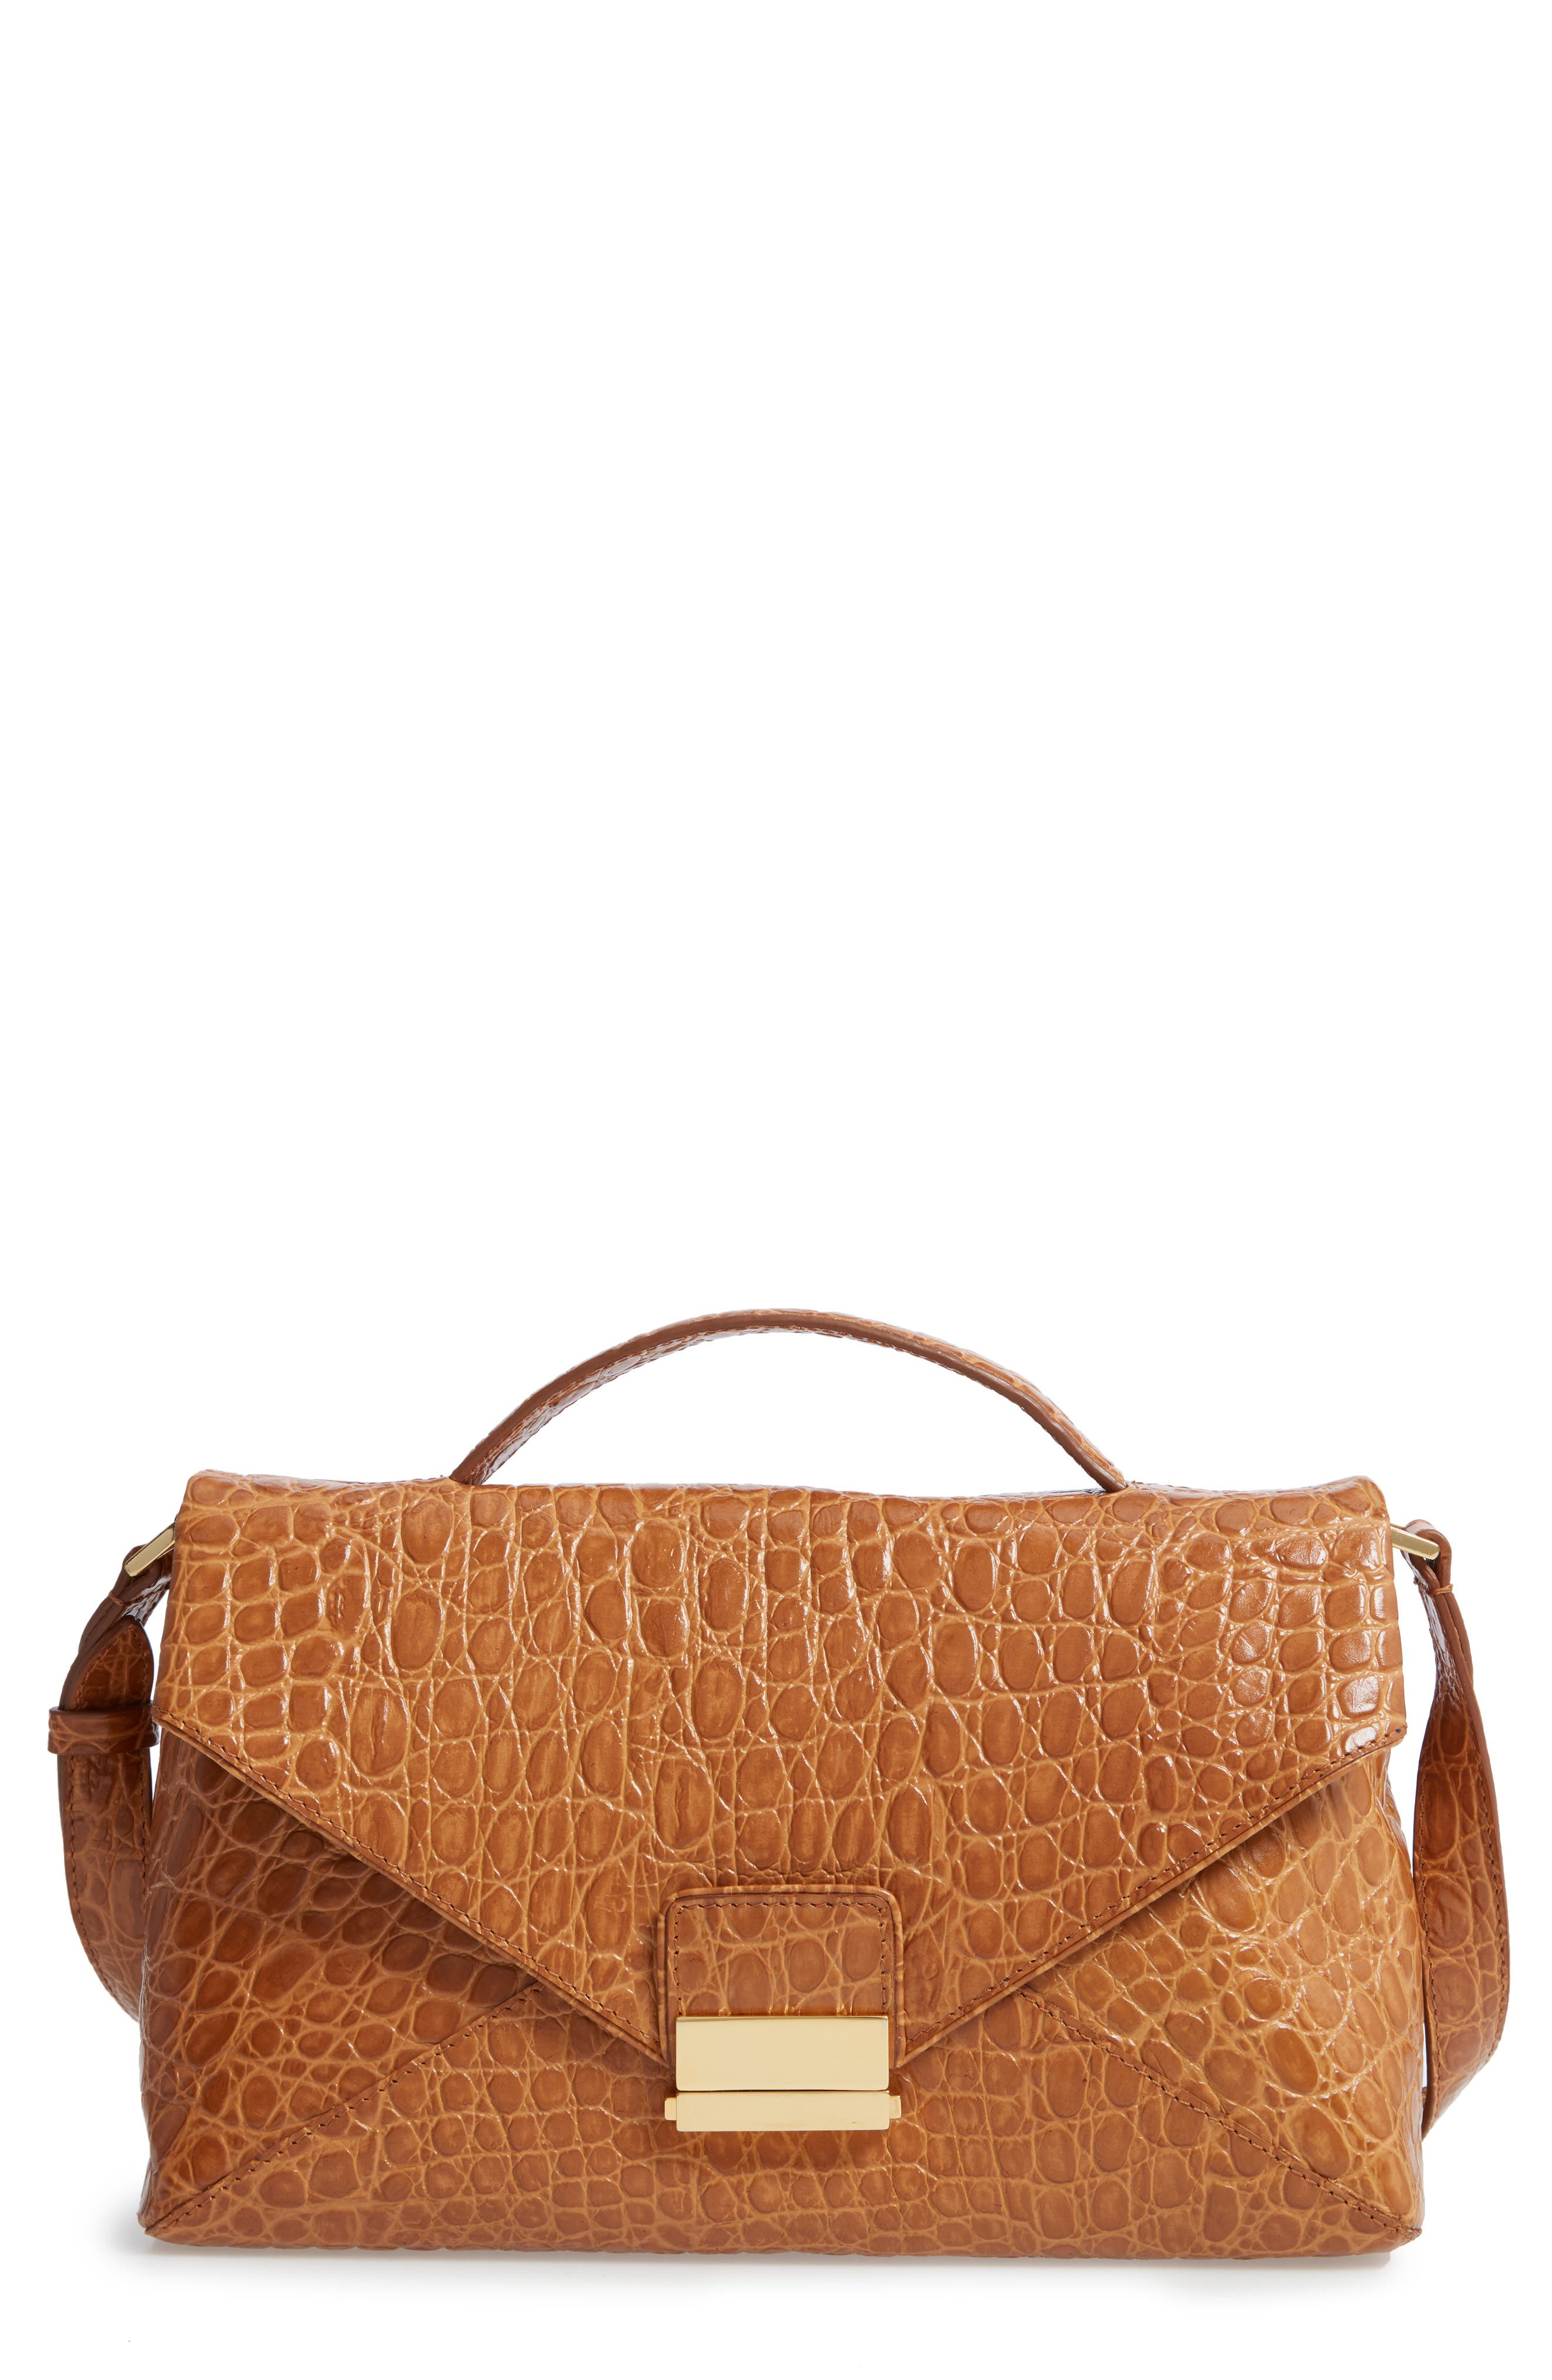 Croc Embossed Leather Shoulder Bag,                             Main thumbnail 1, color,                             GOLD